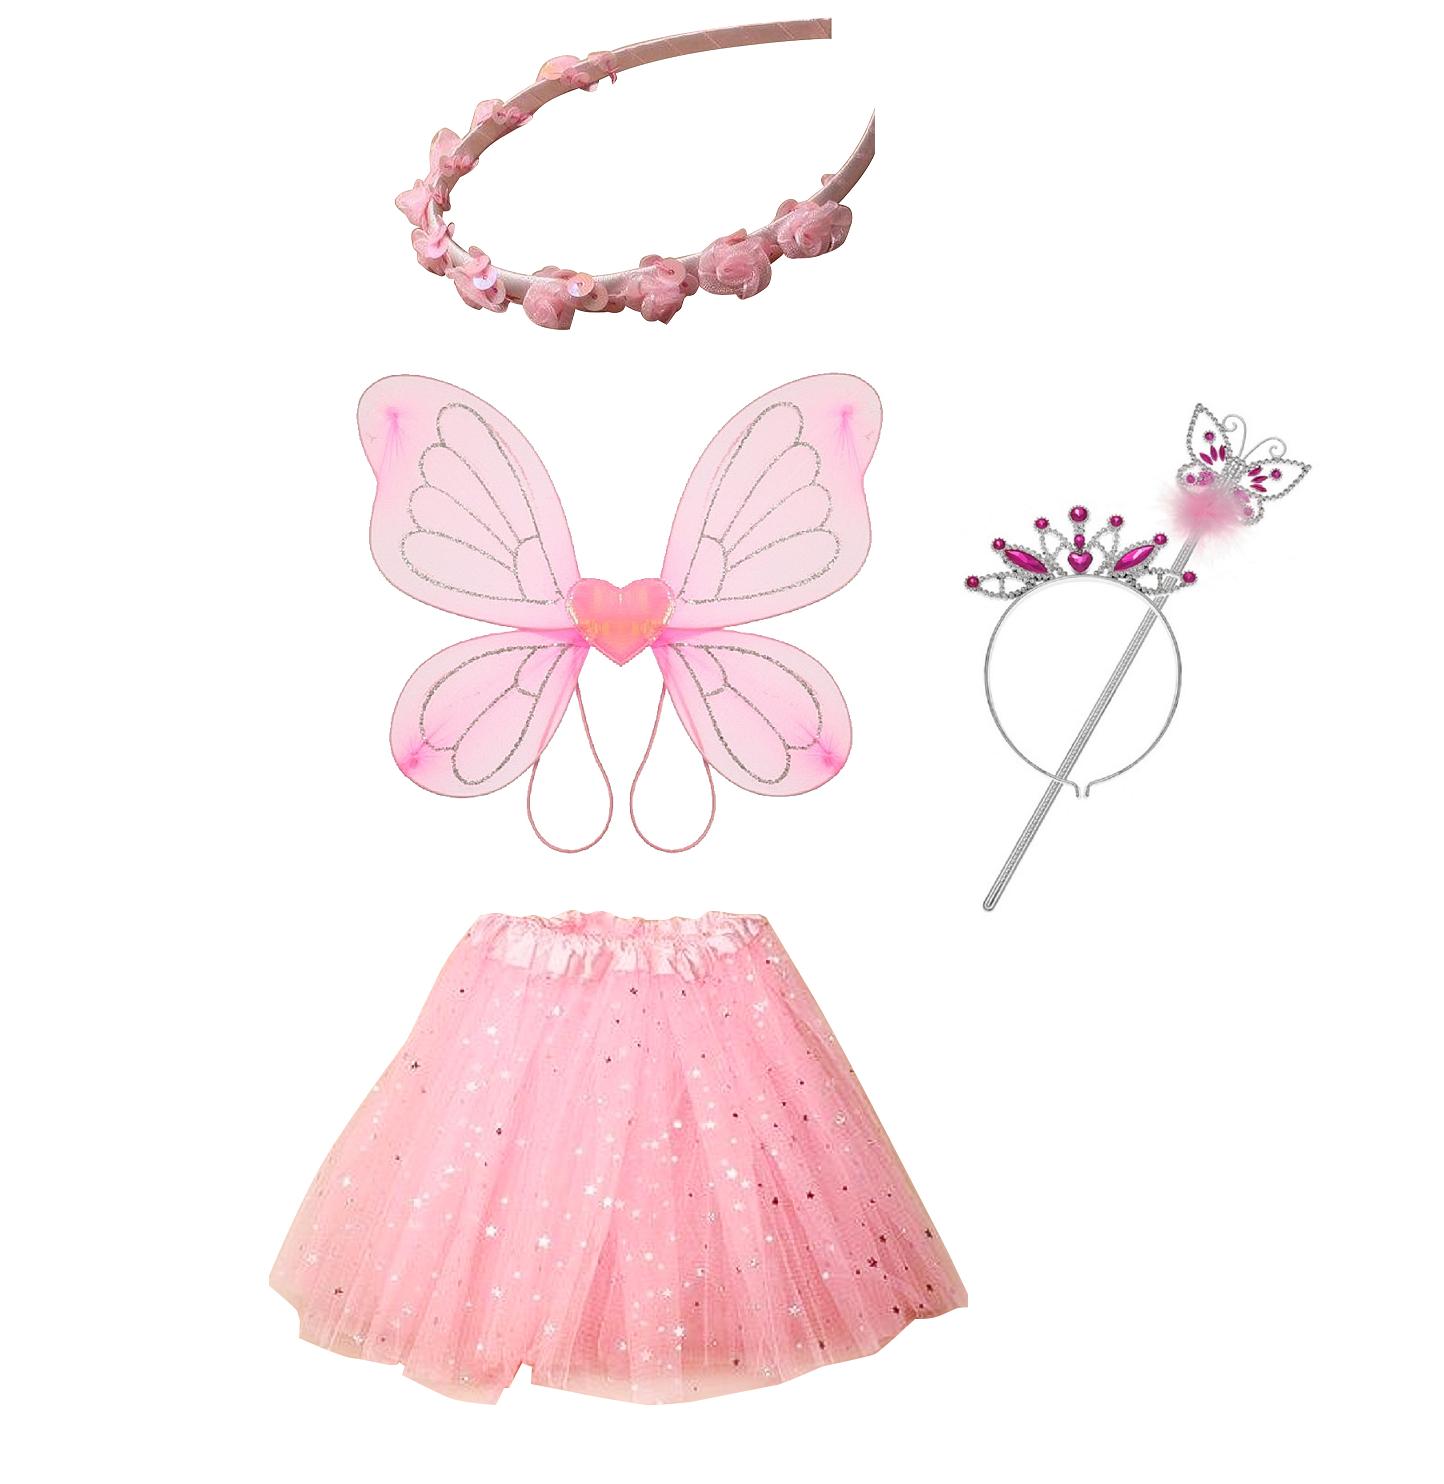 Princess Tiara Wand Fairy Wings Tutu Skirt Party Dress Play Costume Girls Kids